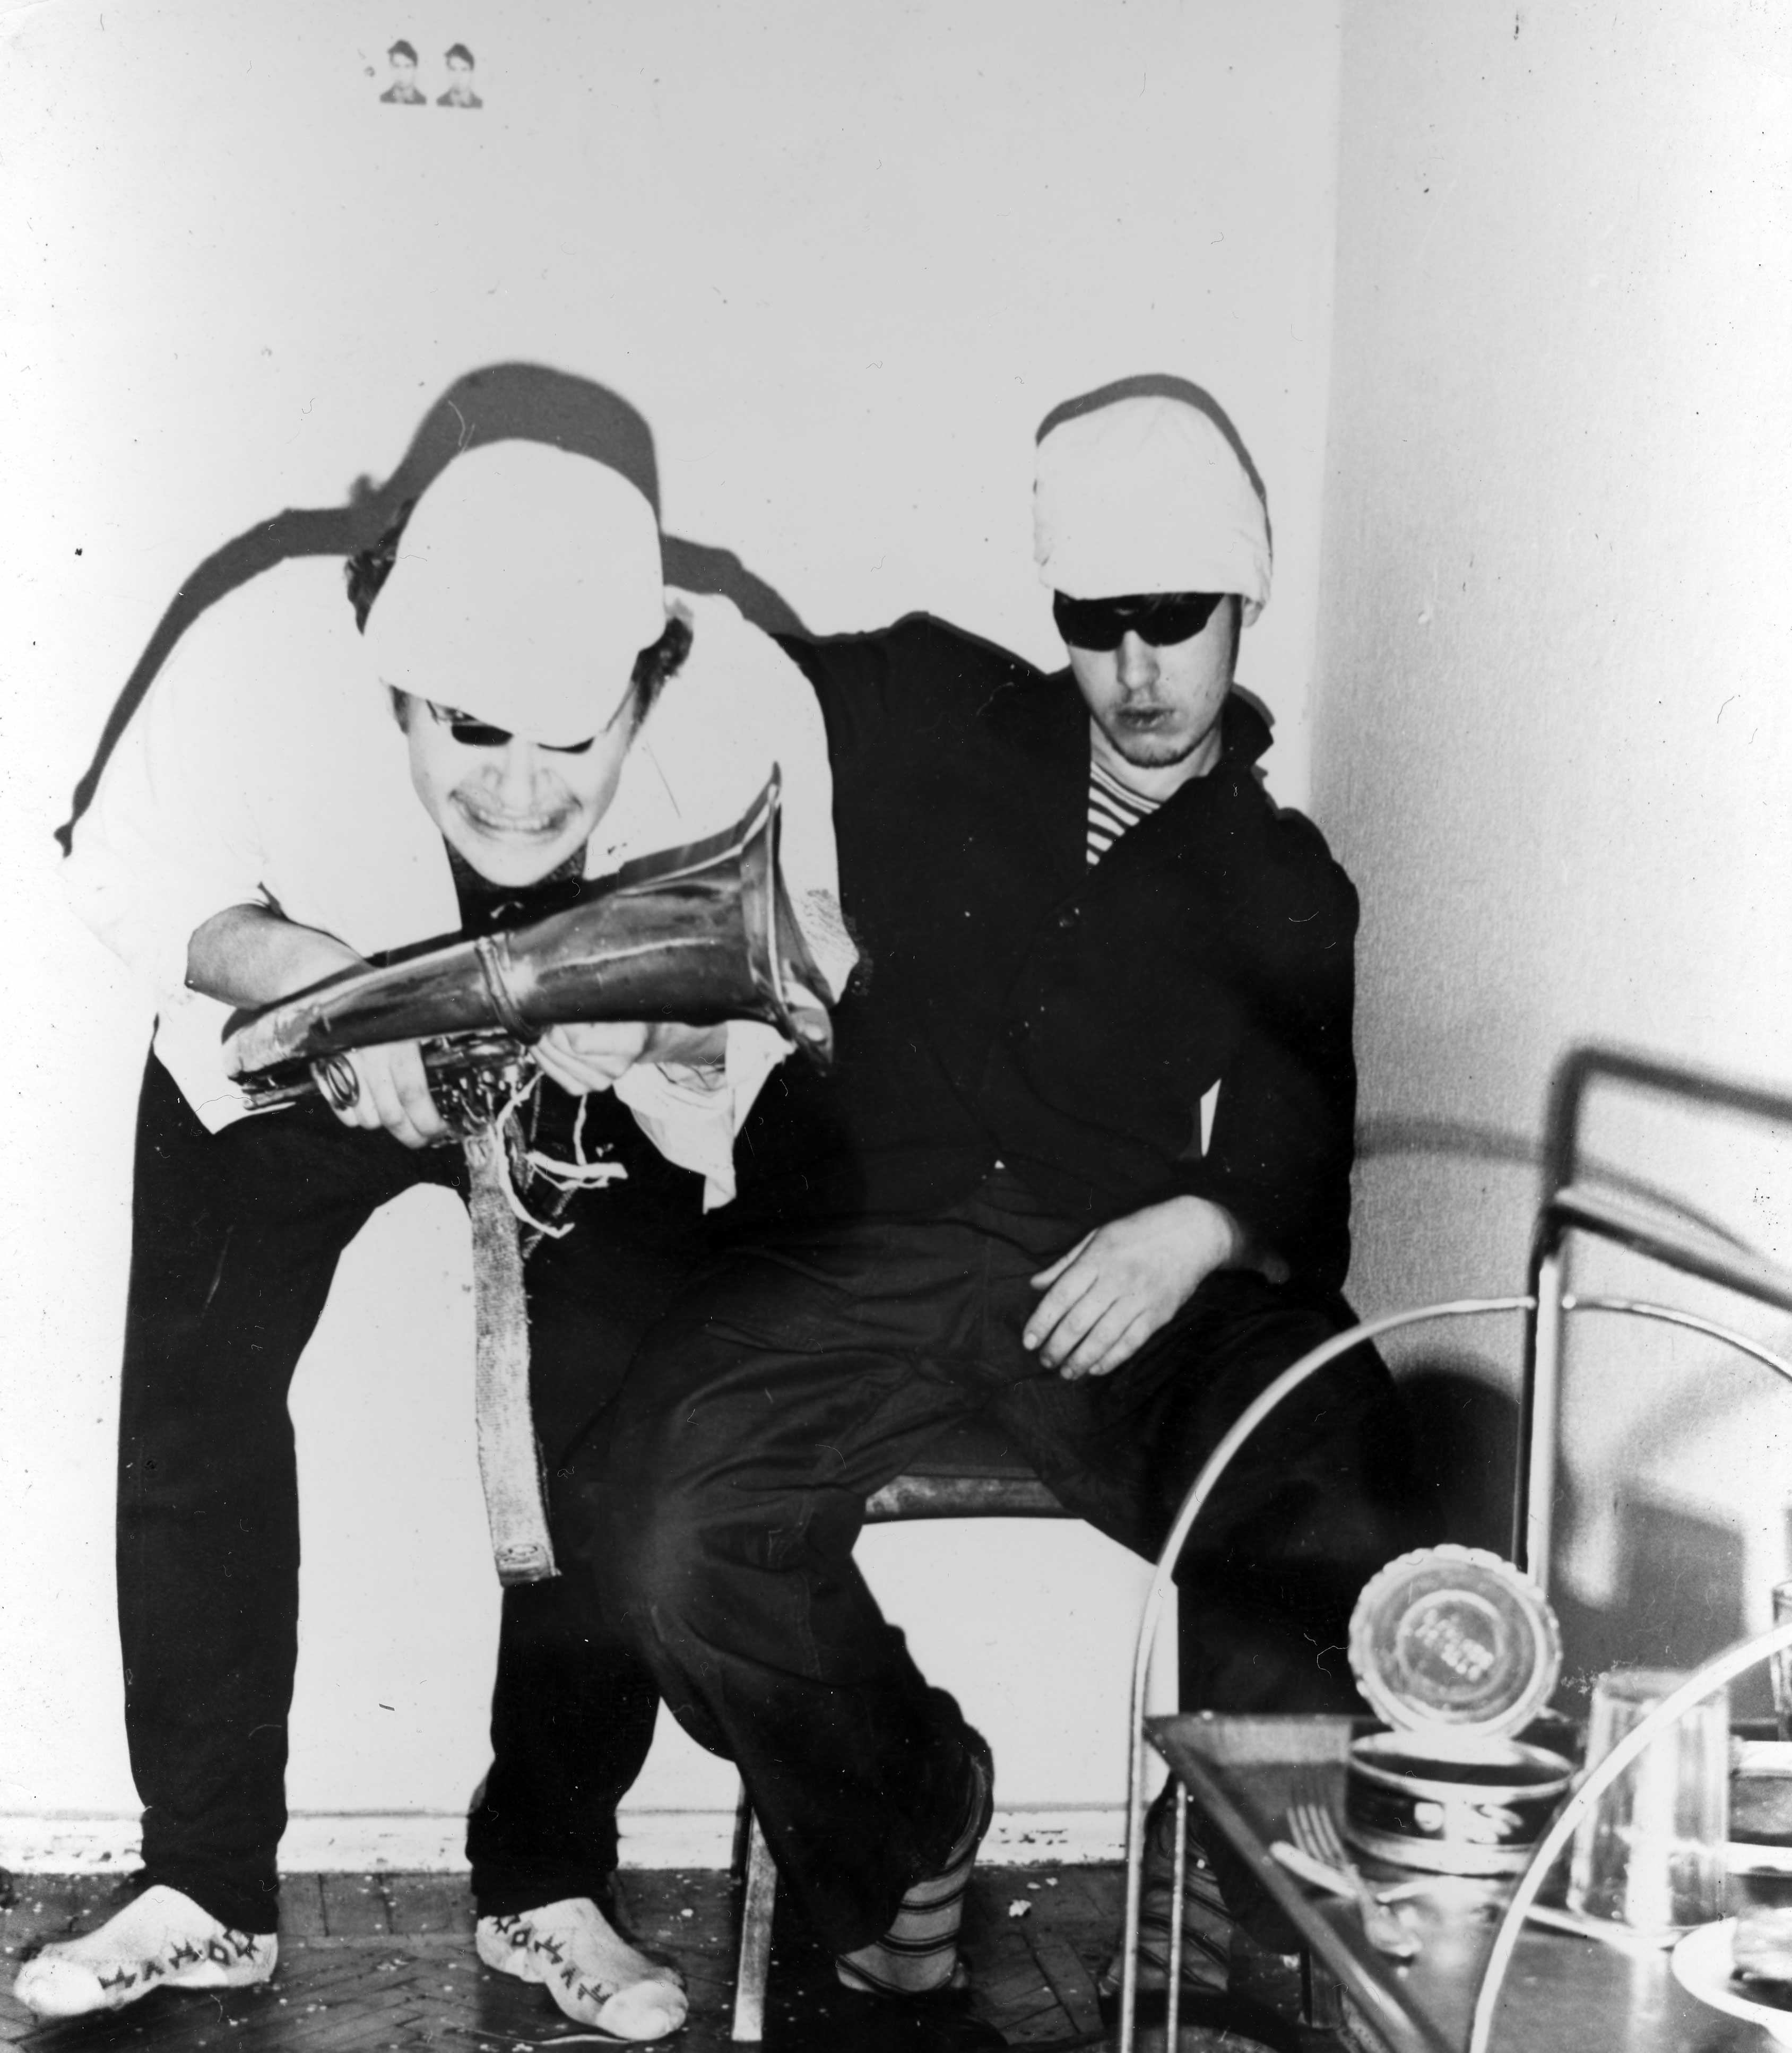 Свин и тусовка (Юфит, Цой и др.), конец 70-х, начало 80-х (6)